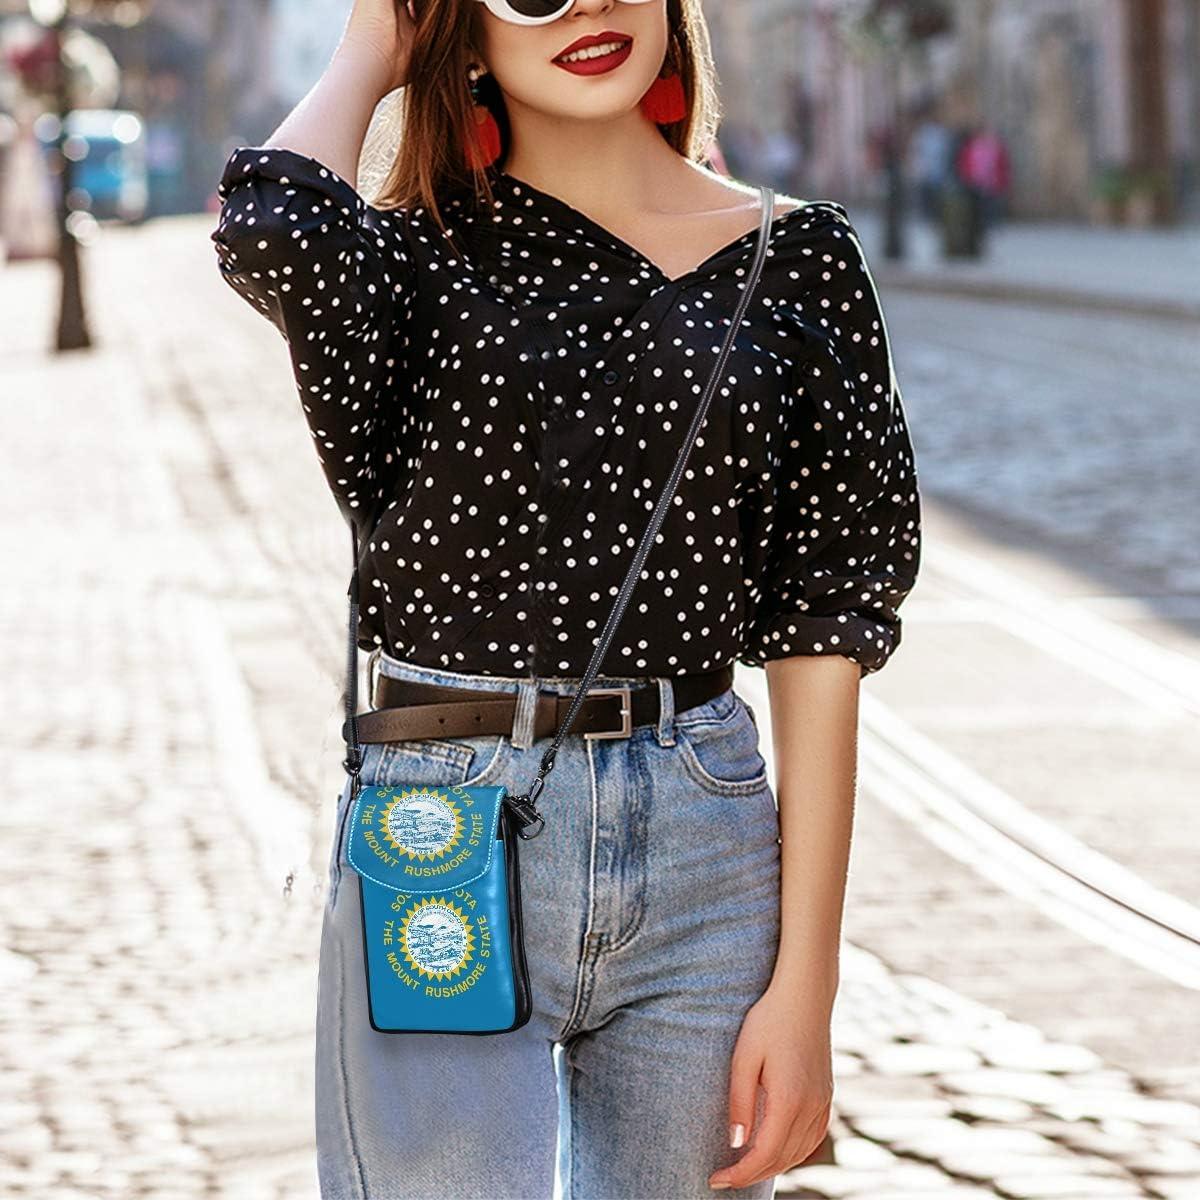 Flag Mini Crossbody Cellphone Purse PU Leather Shoulder Bags Wallet Pouch Handbag